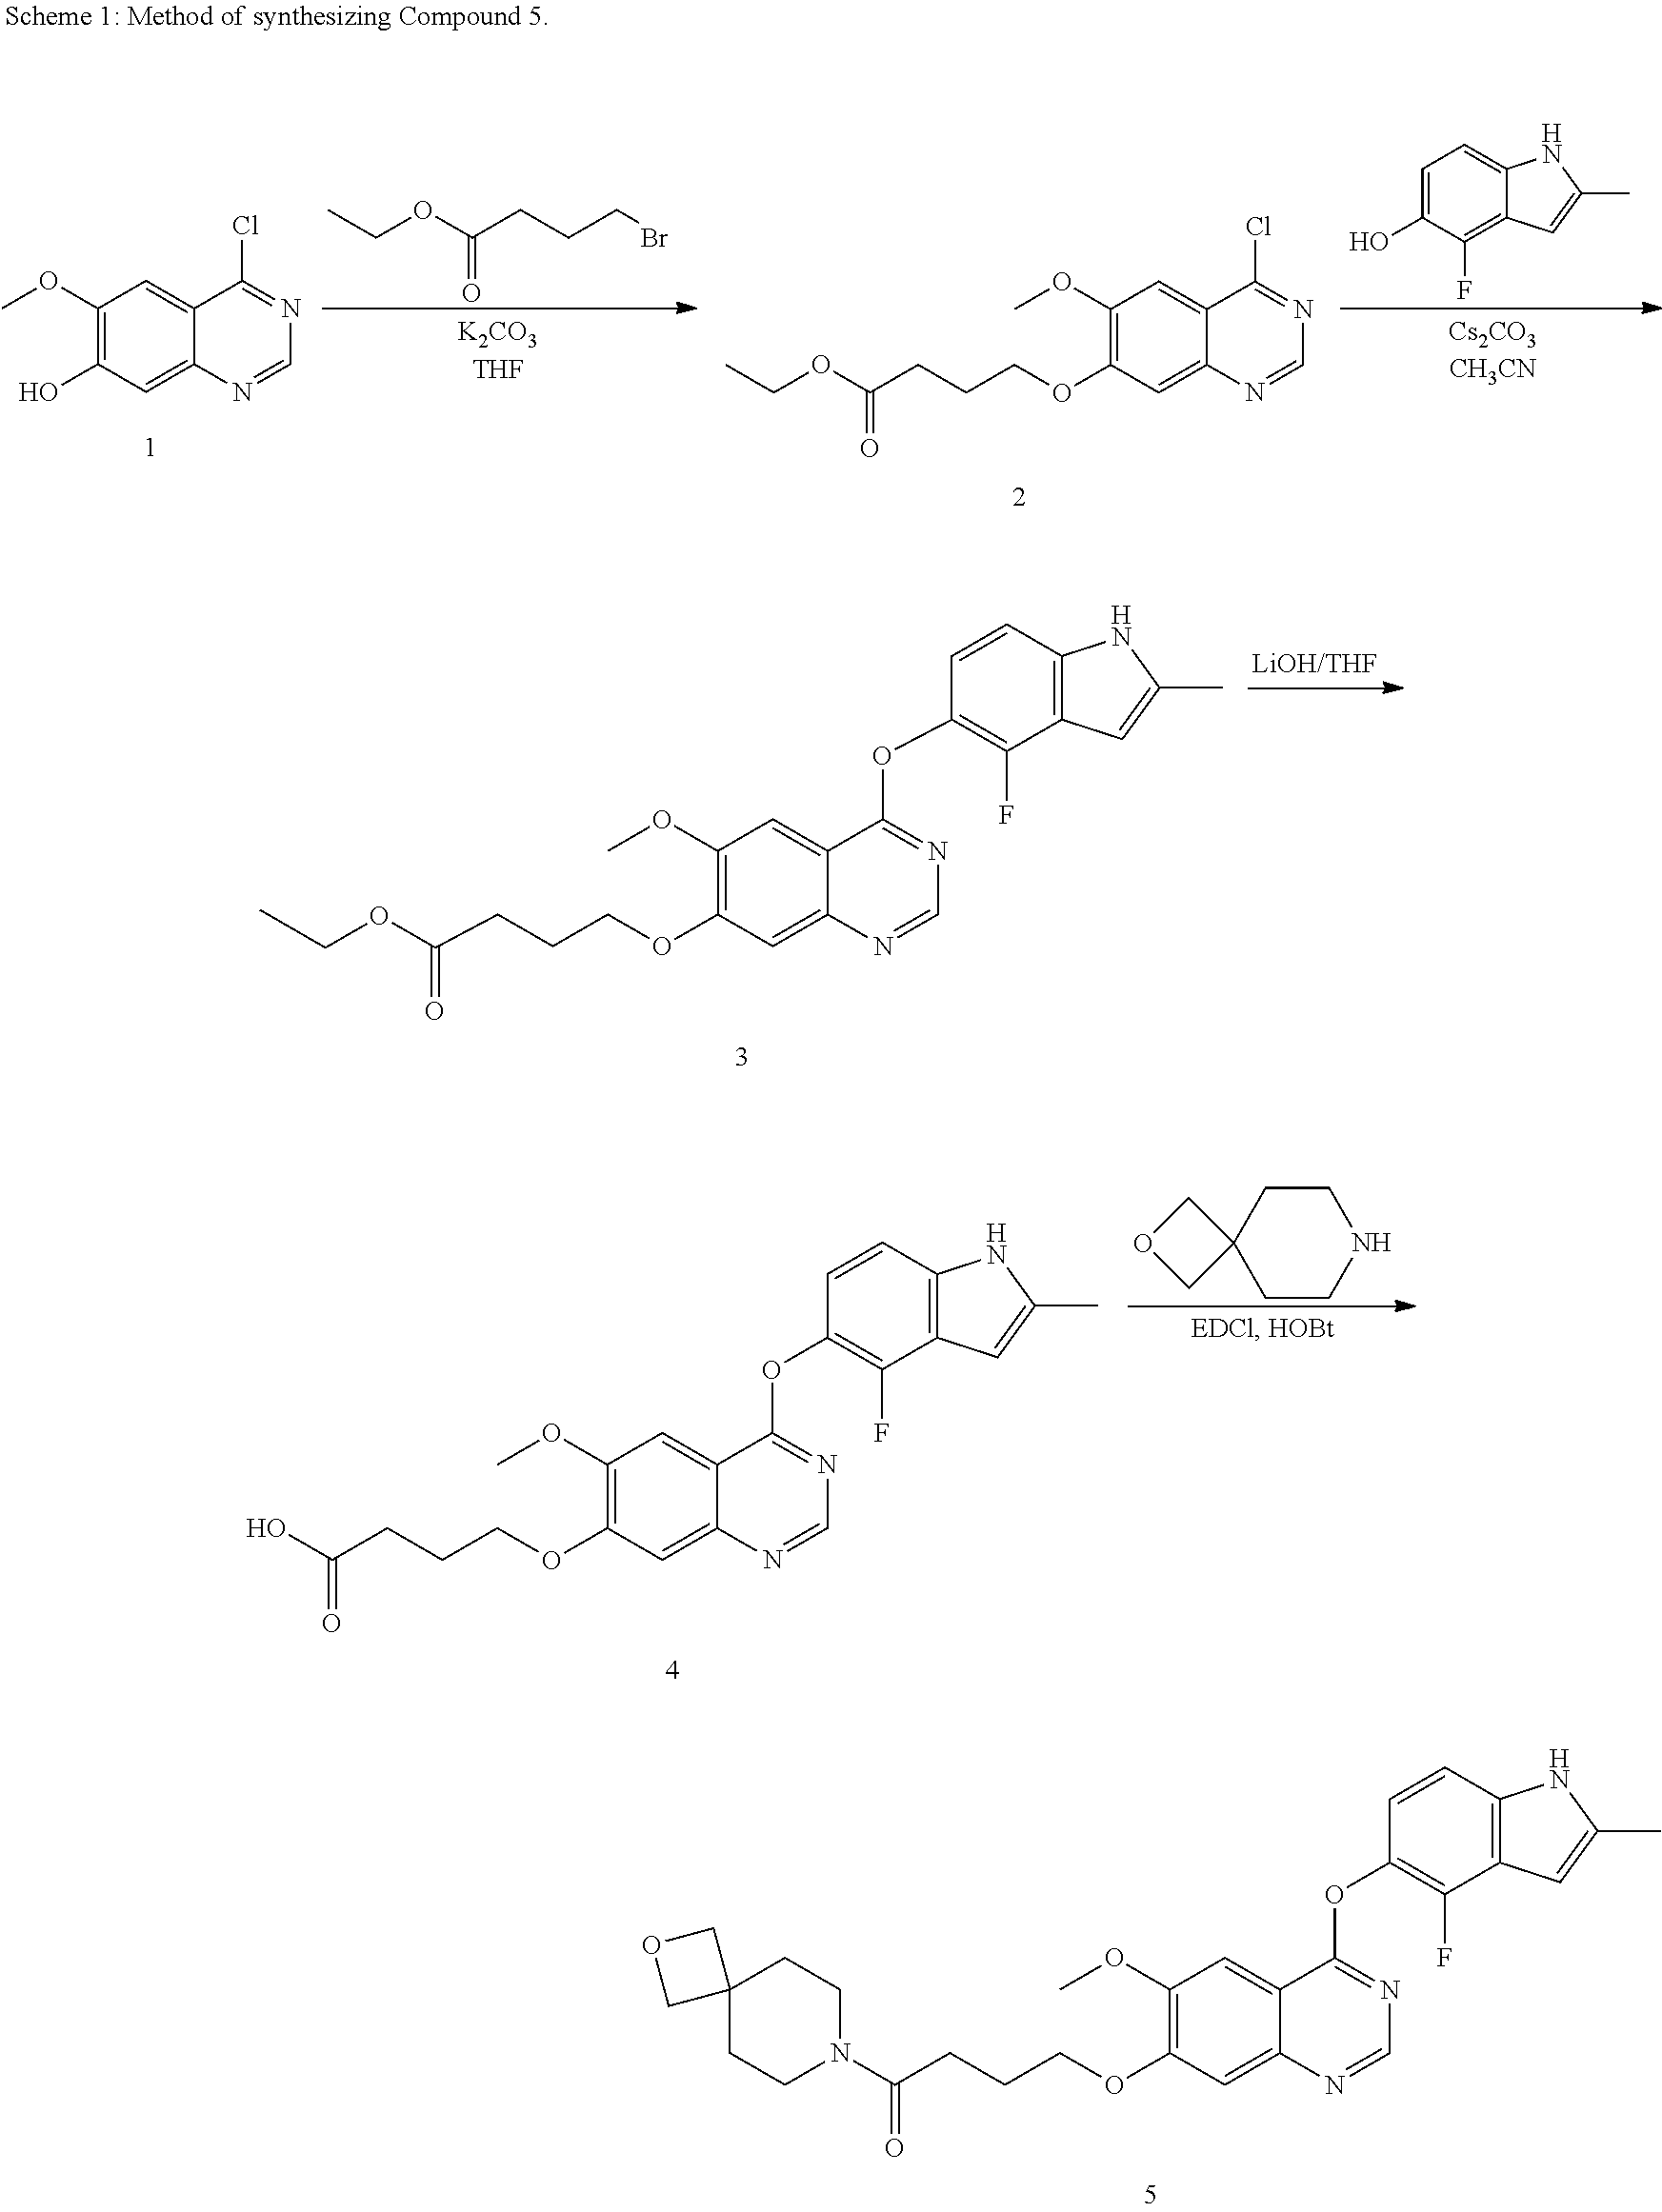 US9688688B2 - Crystalline forms of 4-((4-((4-fluoro-2-methyl